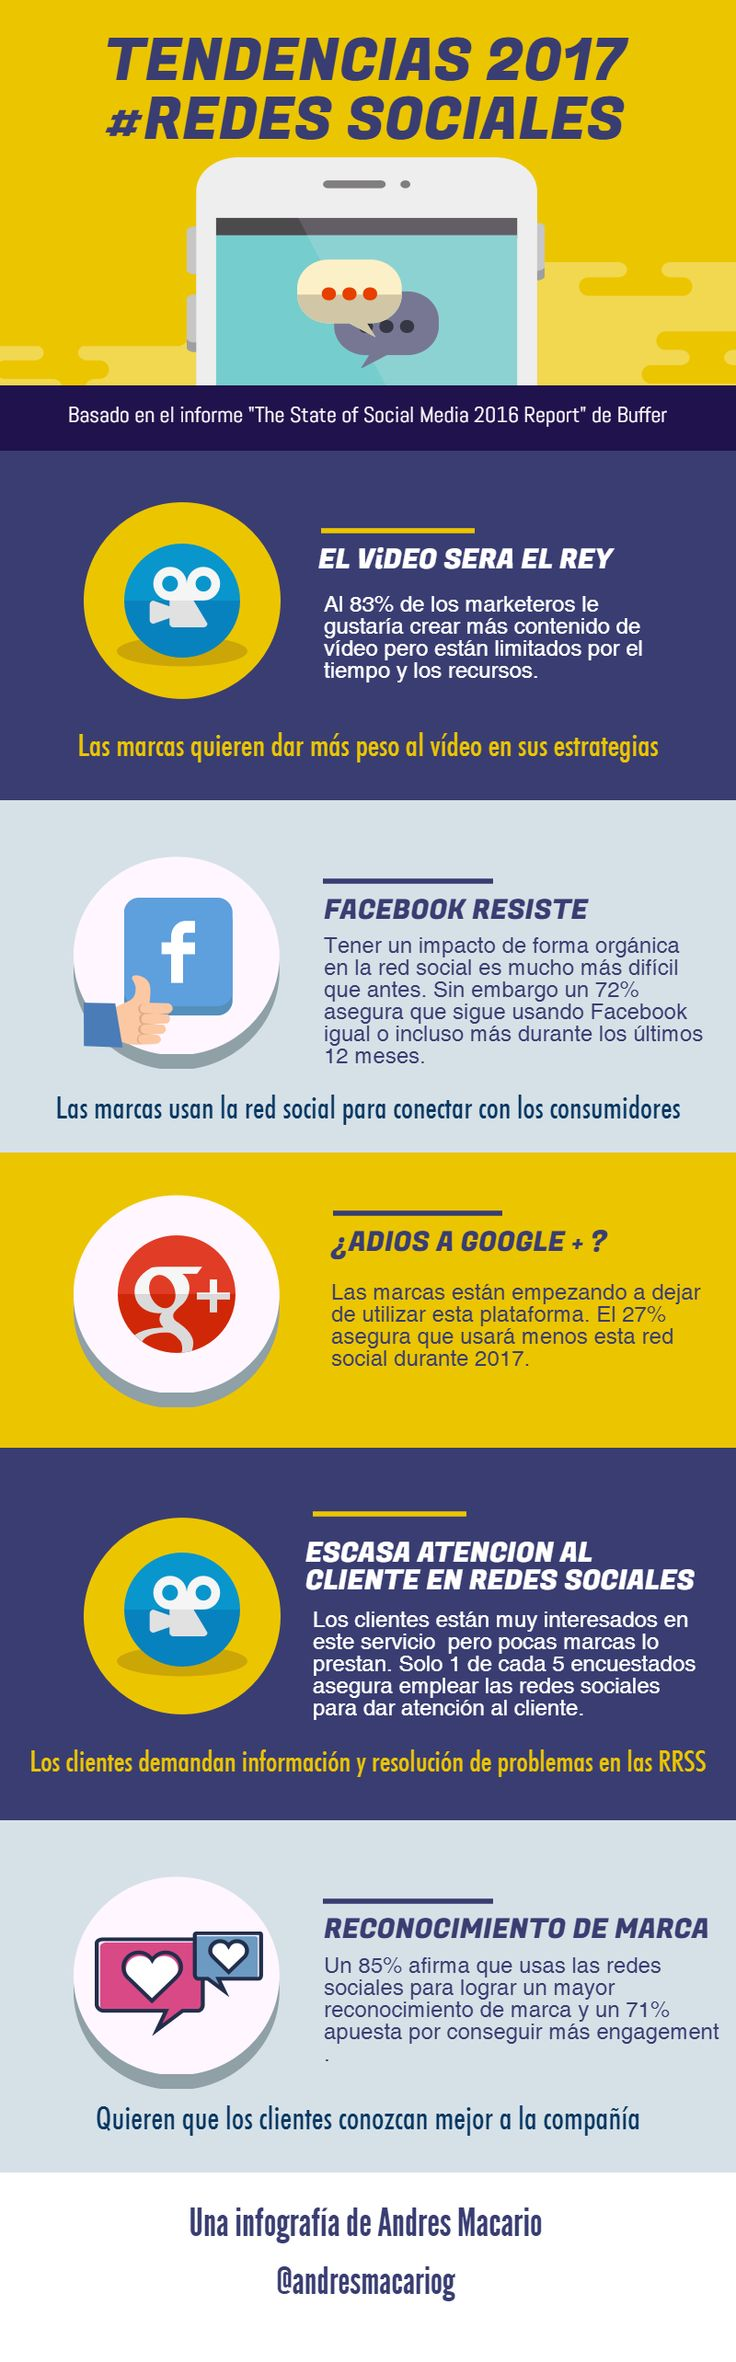 Tendencias Redes Sociales 2017 #infografia